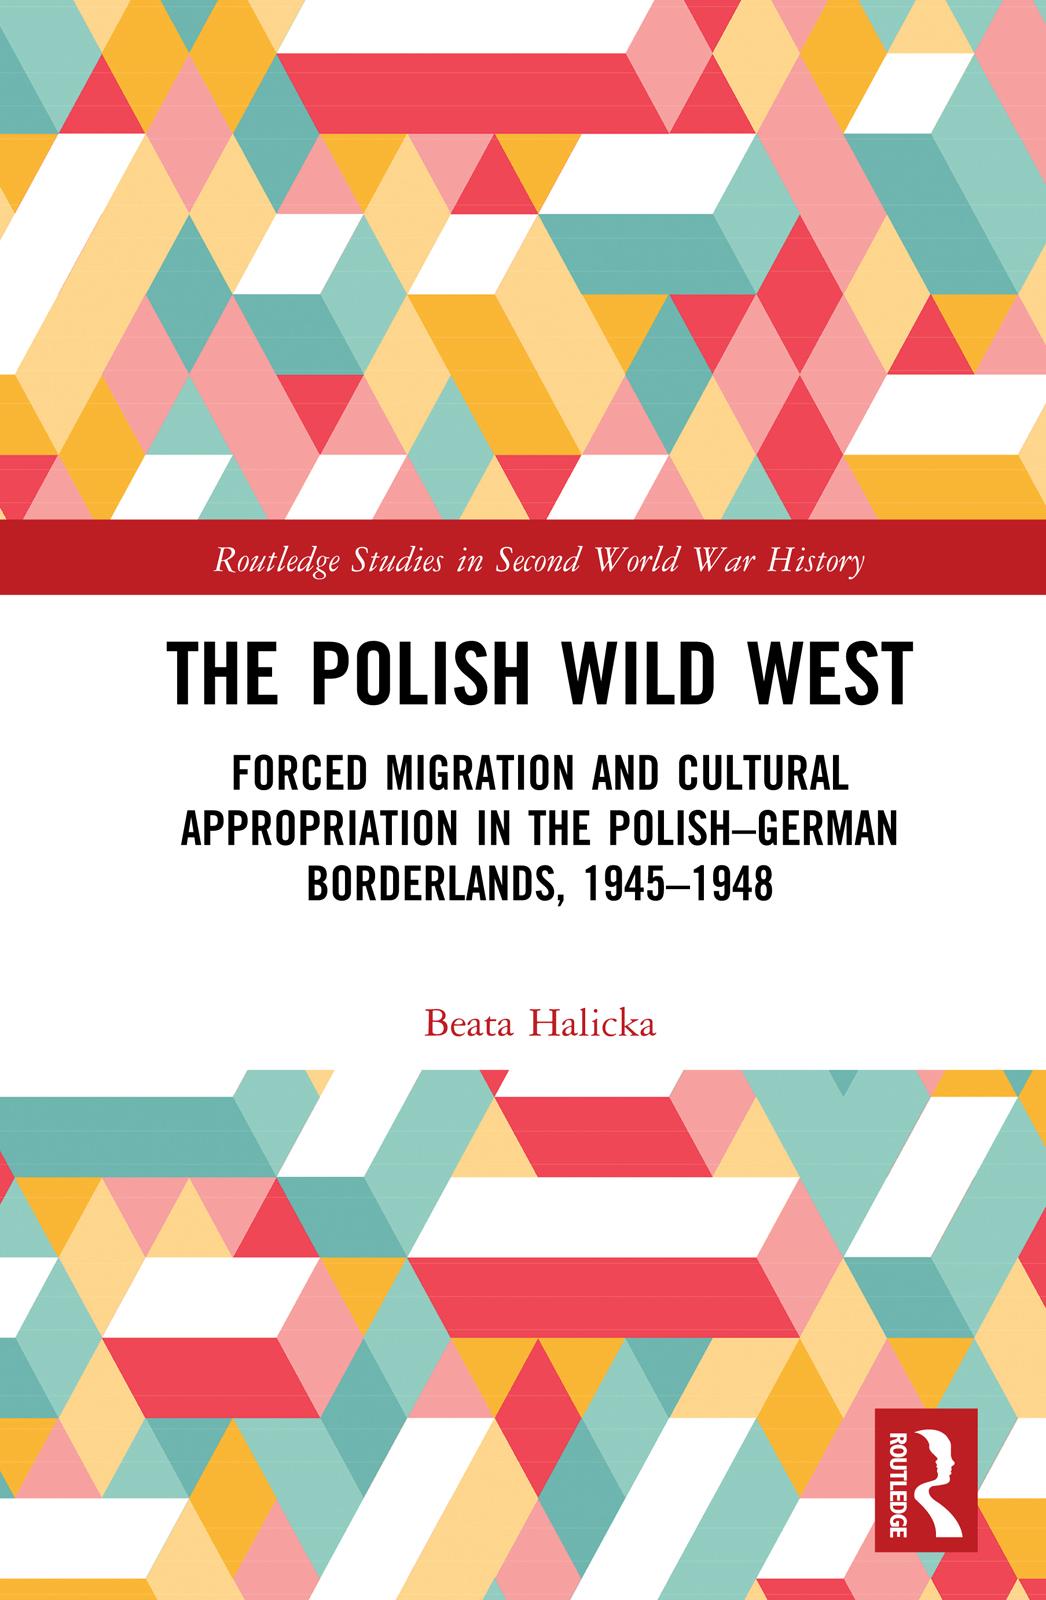 The Polish Wild West